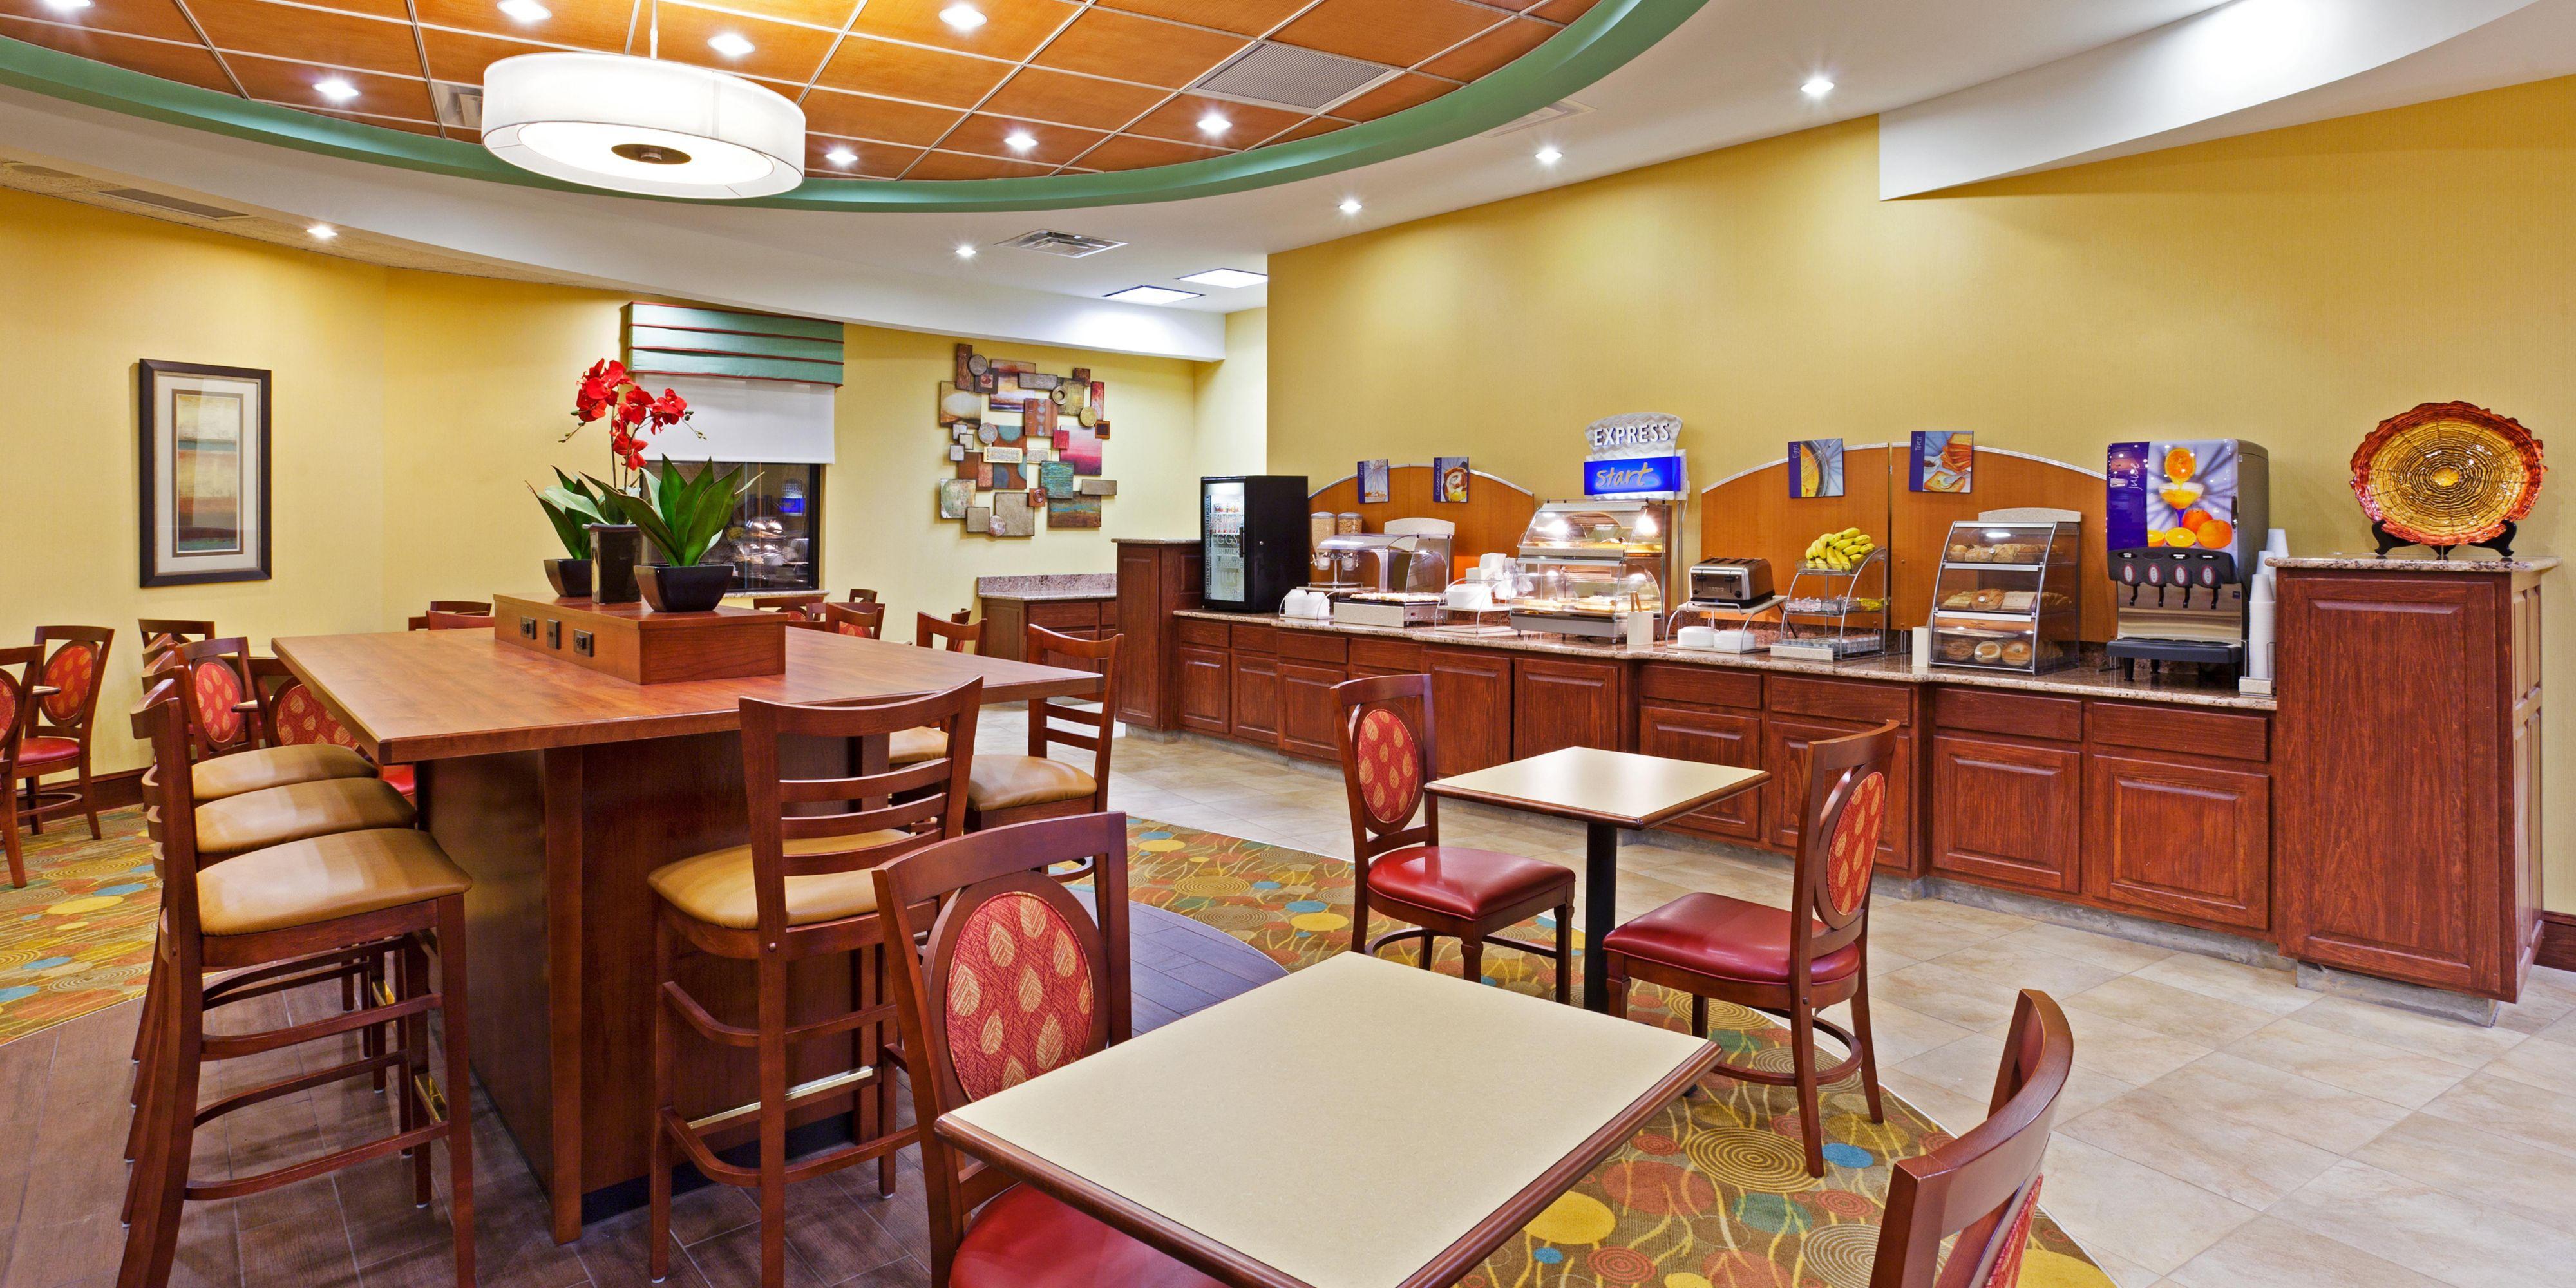 Holiday Inn Express Greensboro-(I-40 @ Wendover) Hotel by IHG